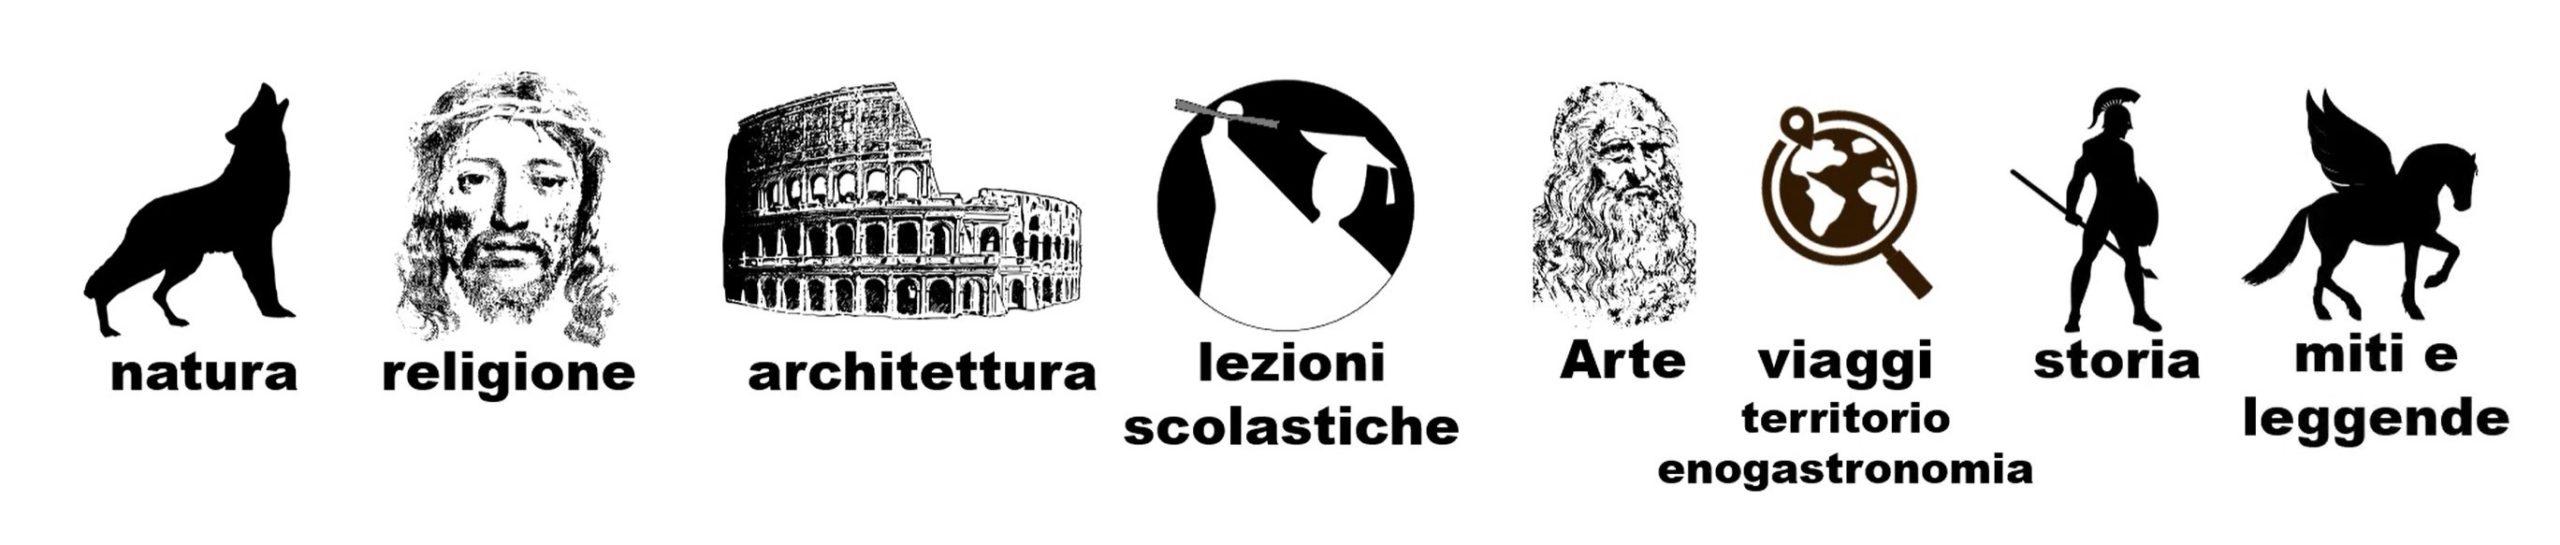 Icone HistoriCal